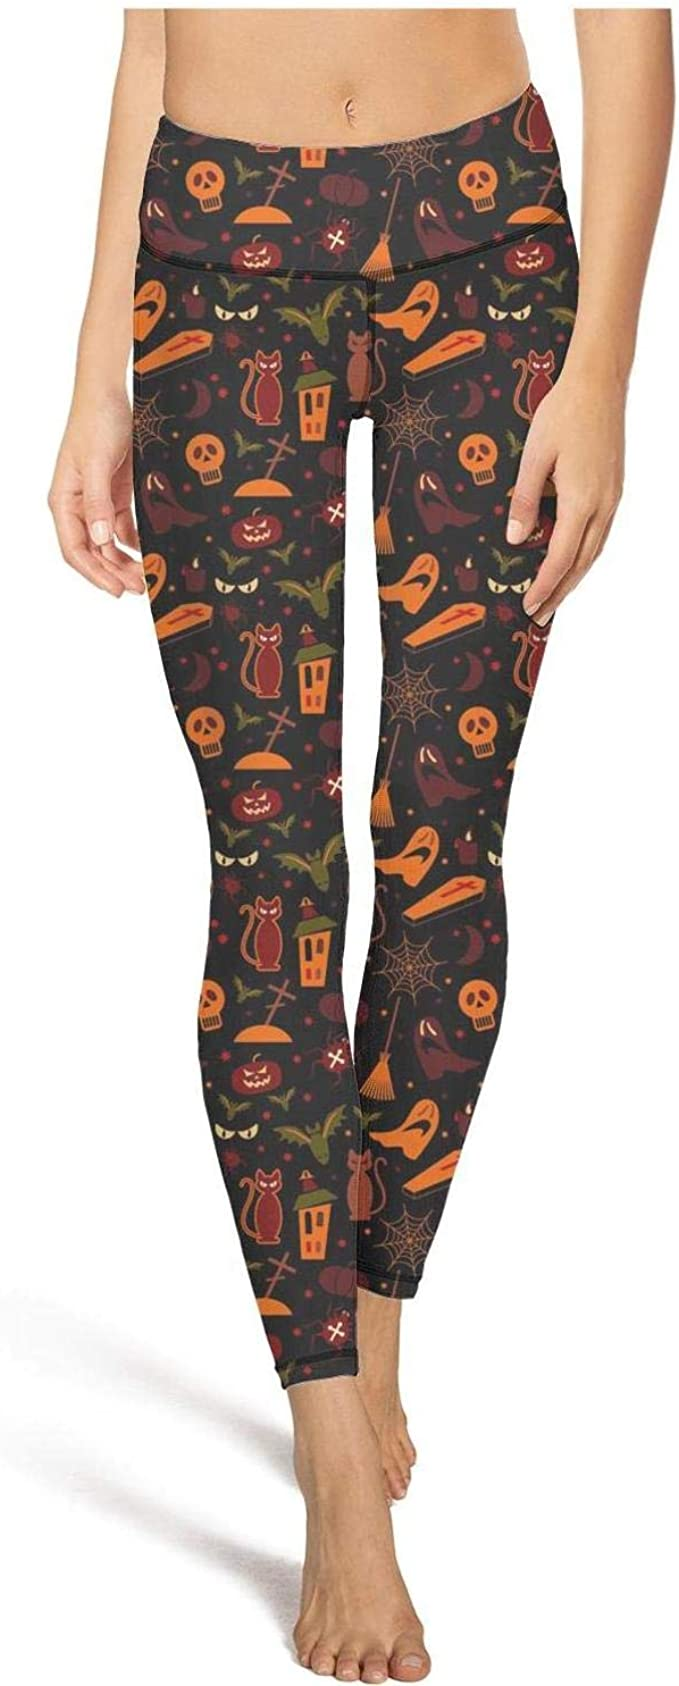 Girl Yoga Pants Halloween cat Ghost Super Soft Yoga Leggings with Pockets